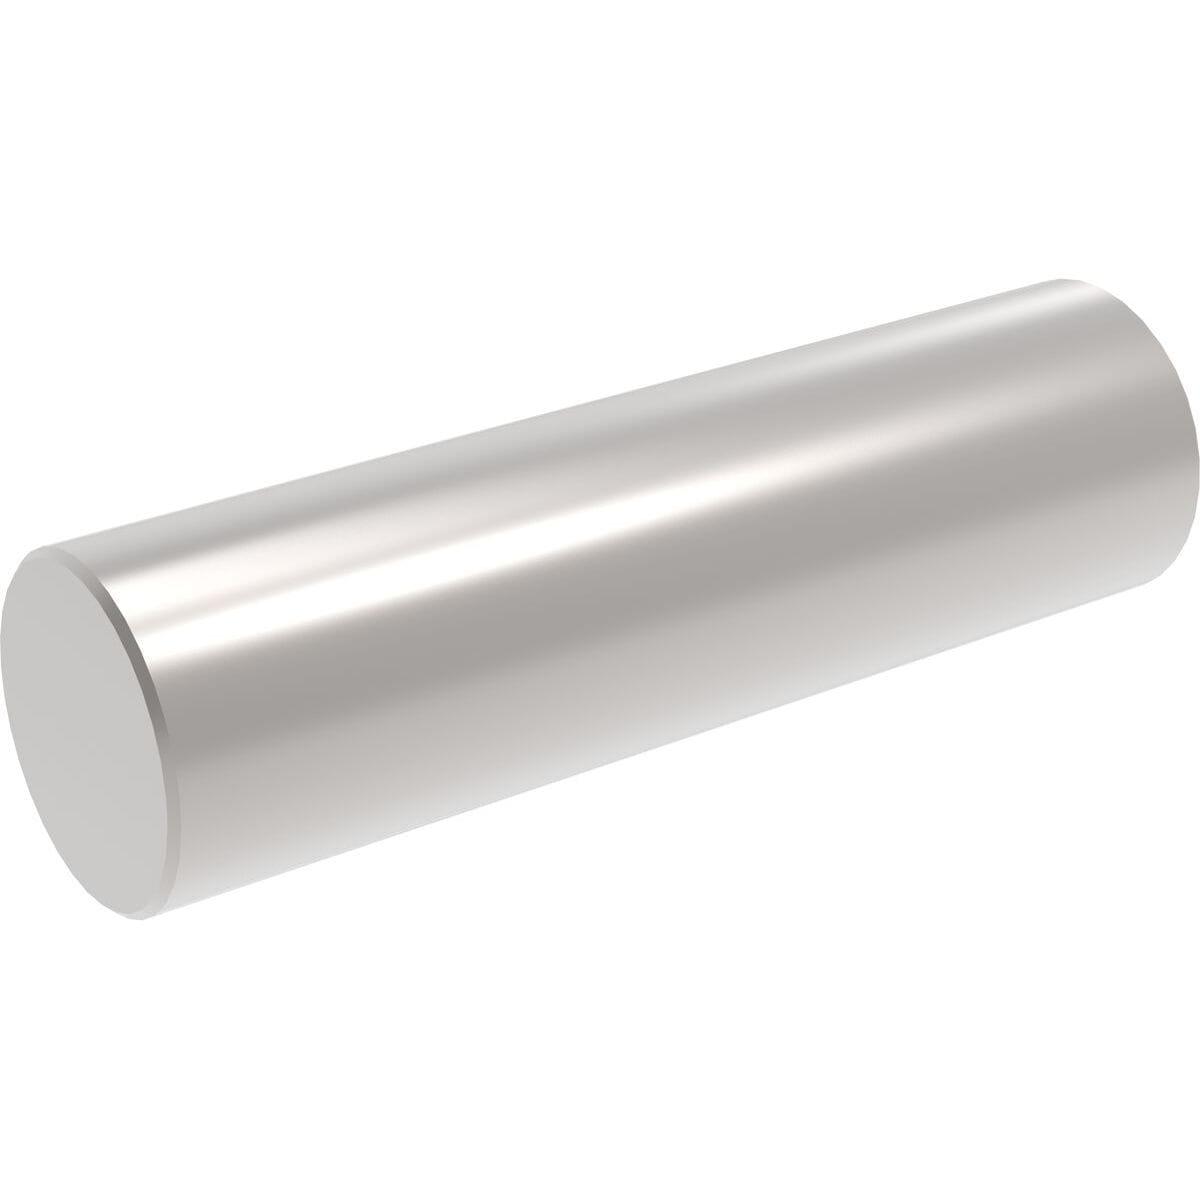 "4.75/"" x 1.5/"" Stainless Steel Pin Dowel Straight Round Stock    #1"